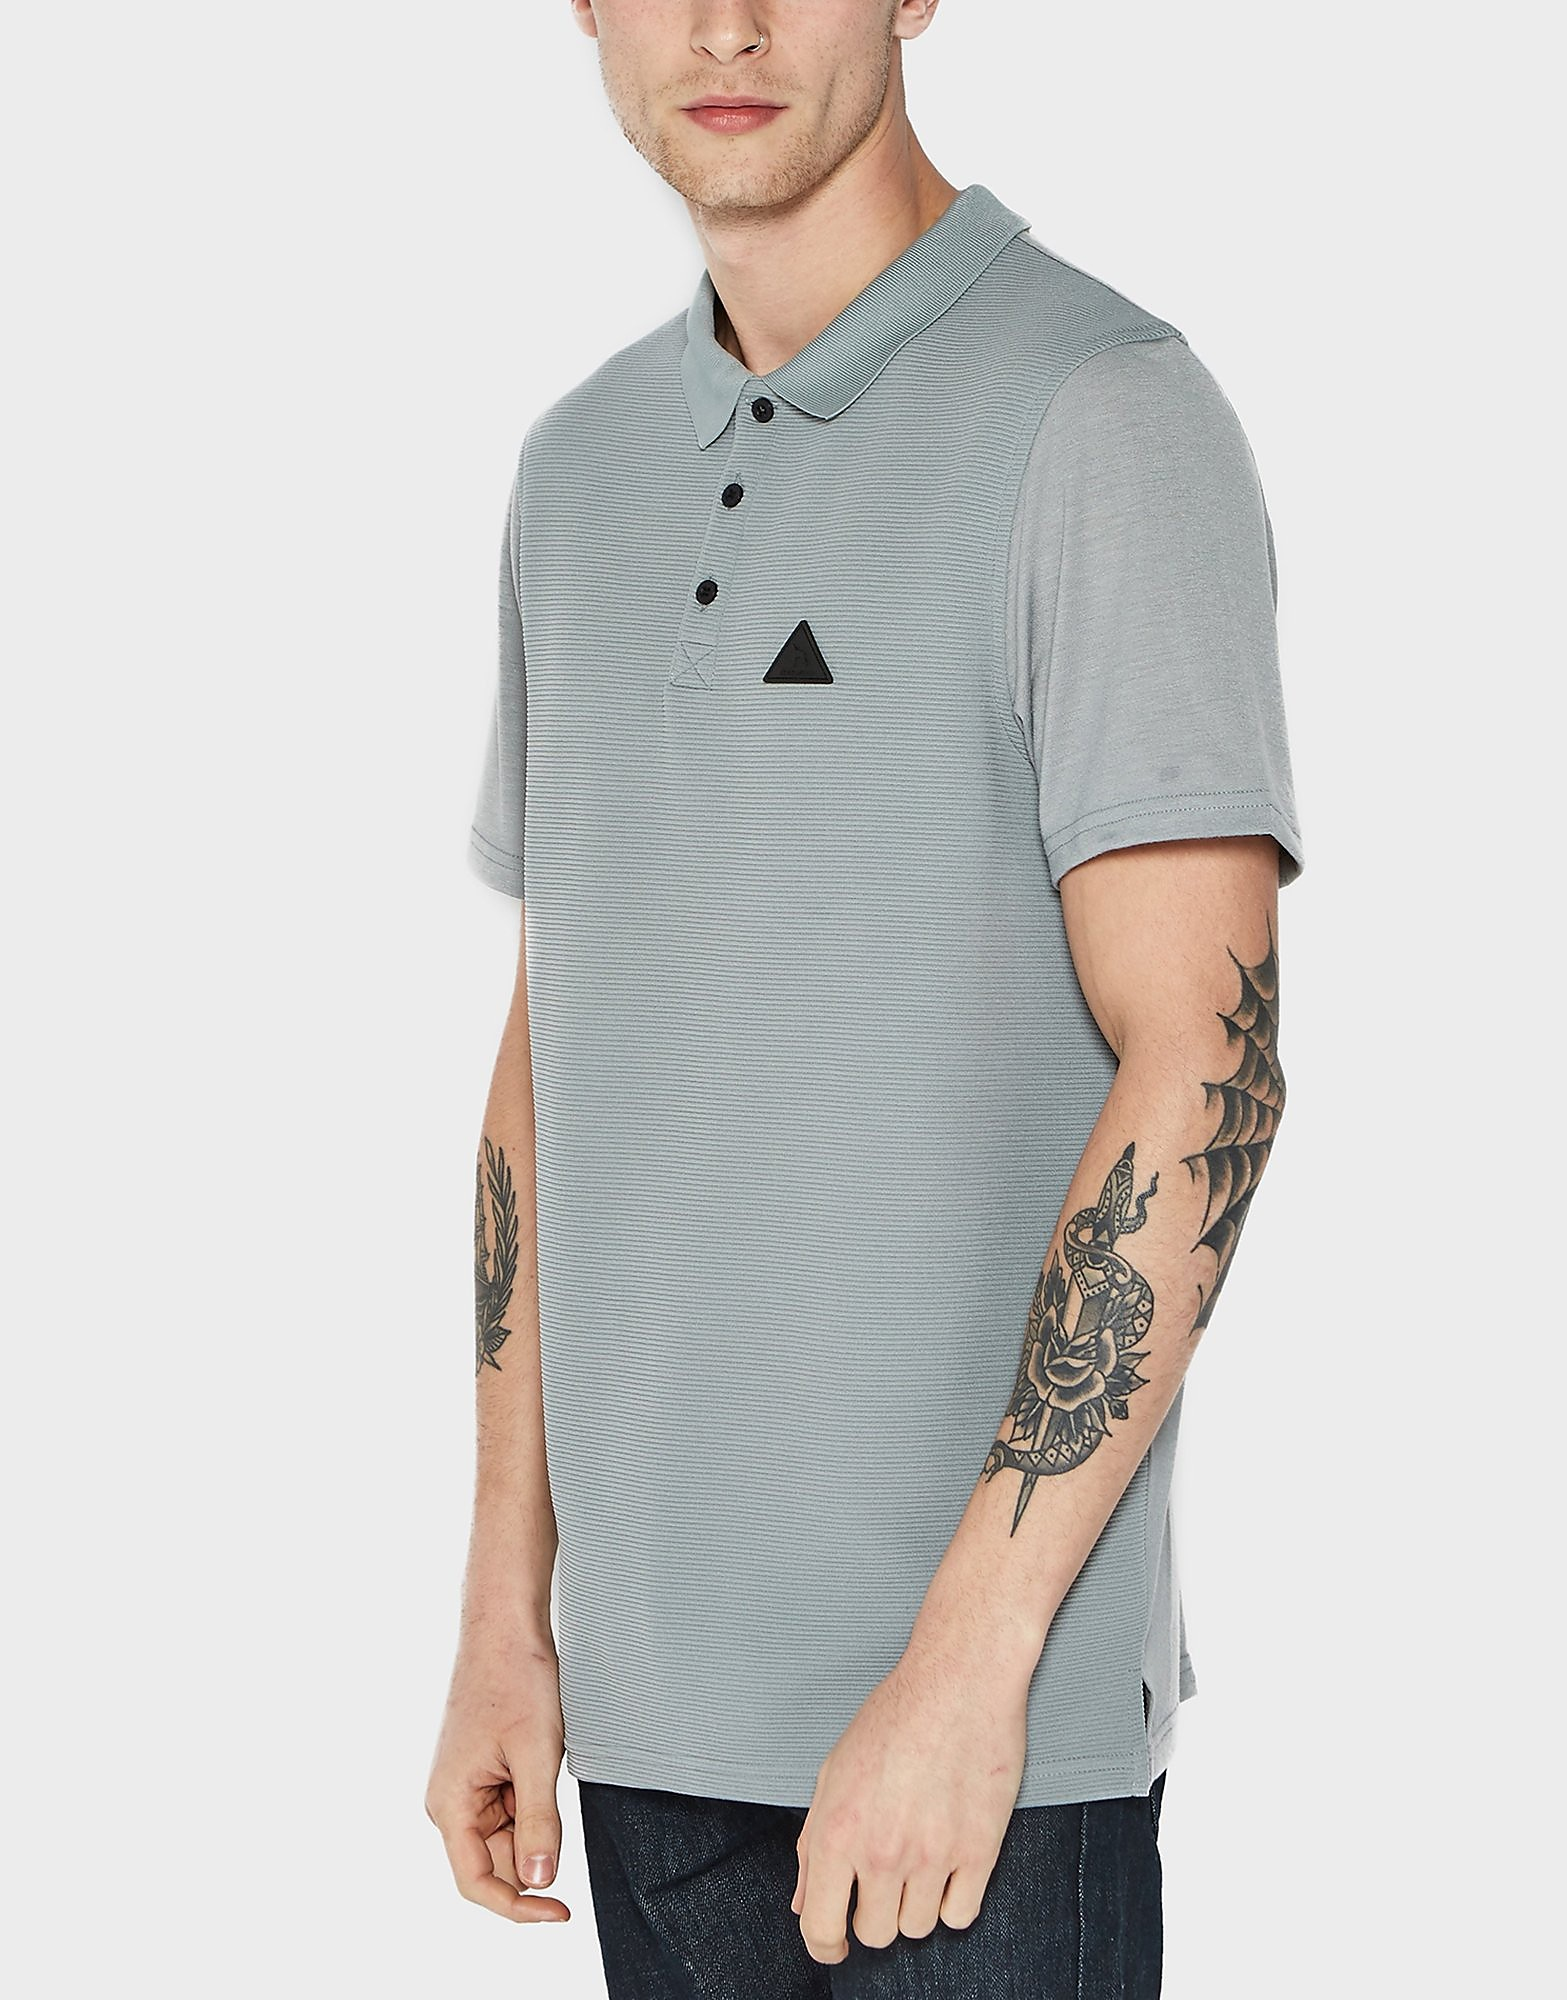 One True Saxon Access Polo Shirt - Exclusive